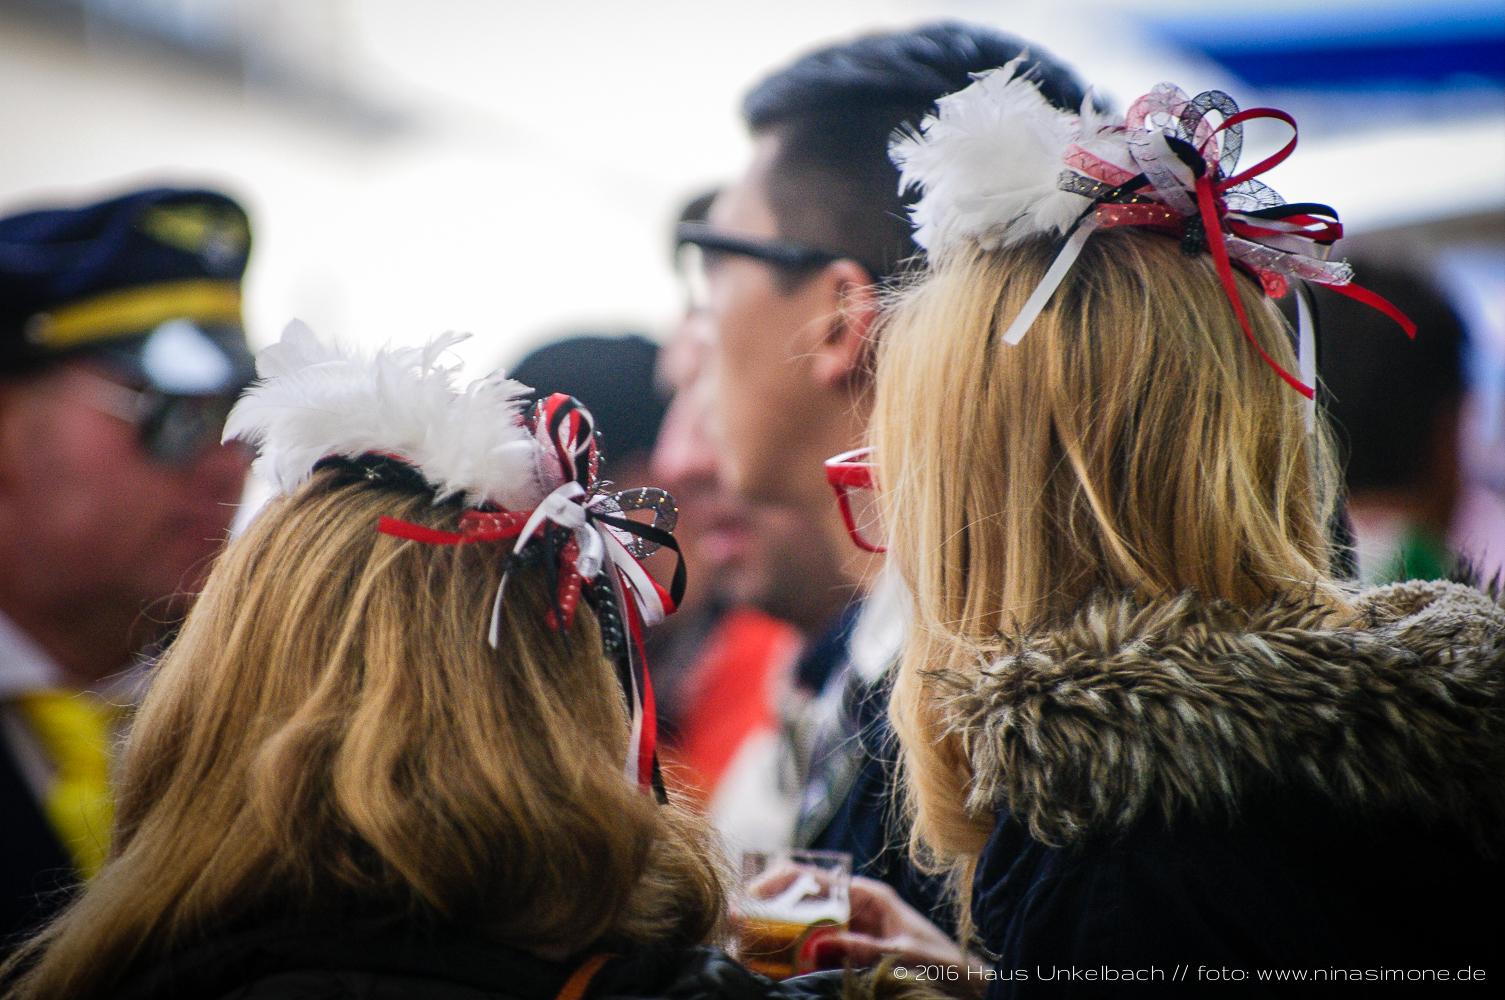 Karneval im Haus Unkelbach